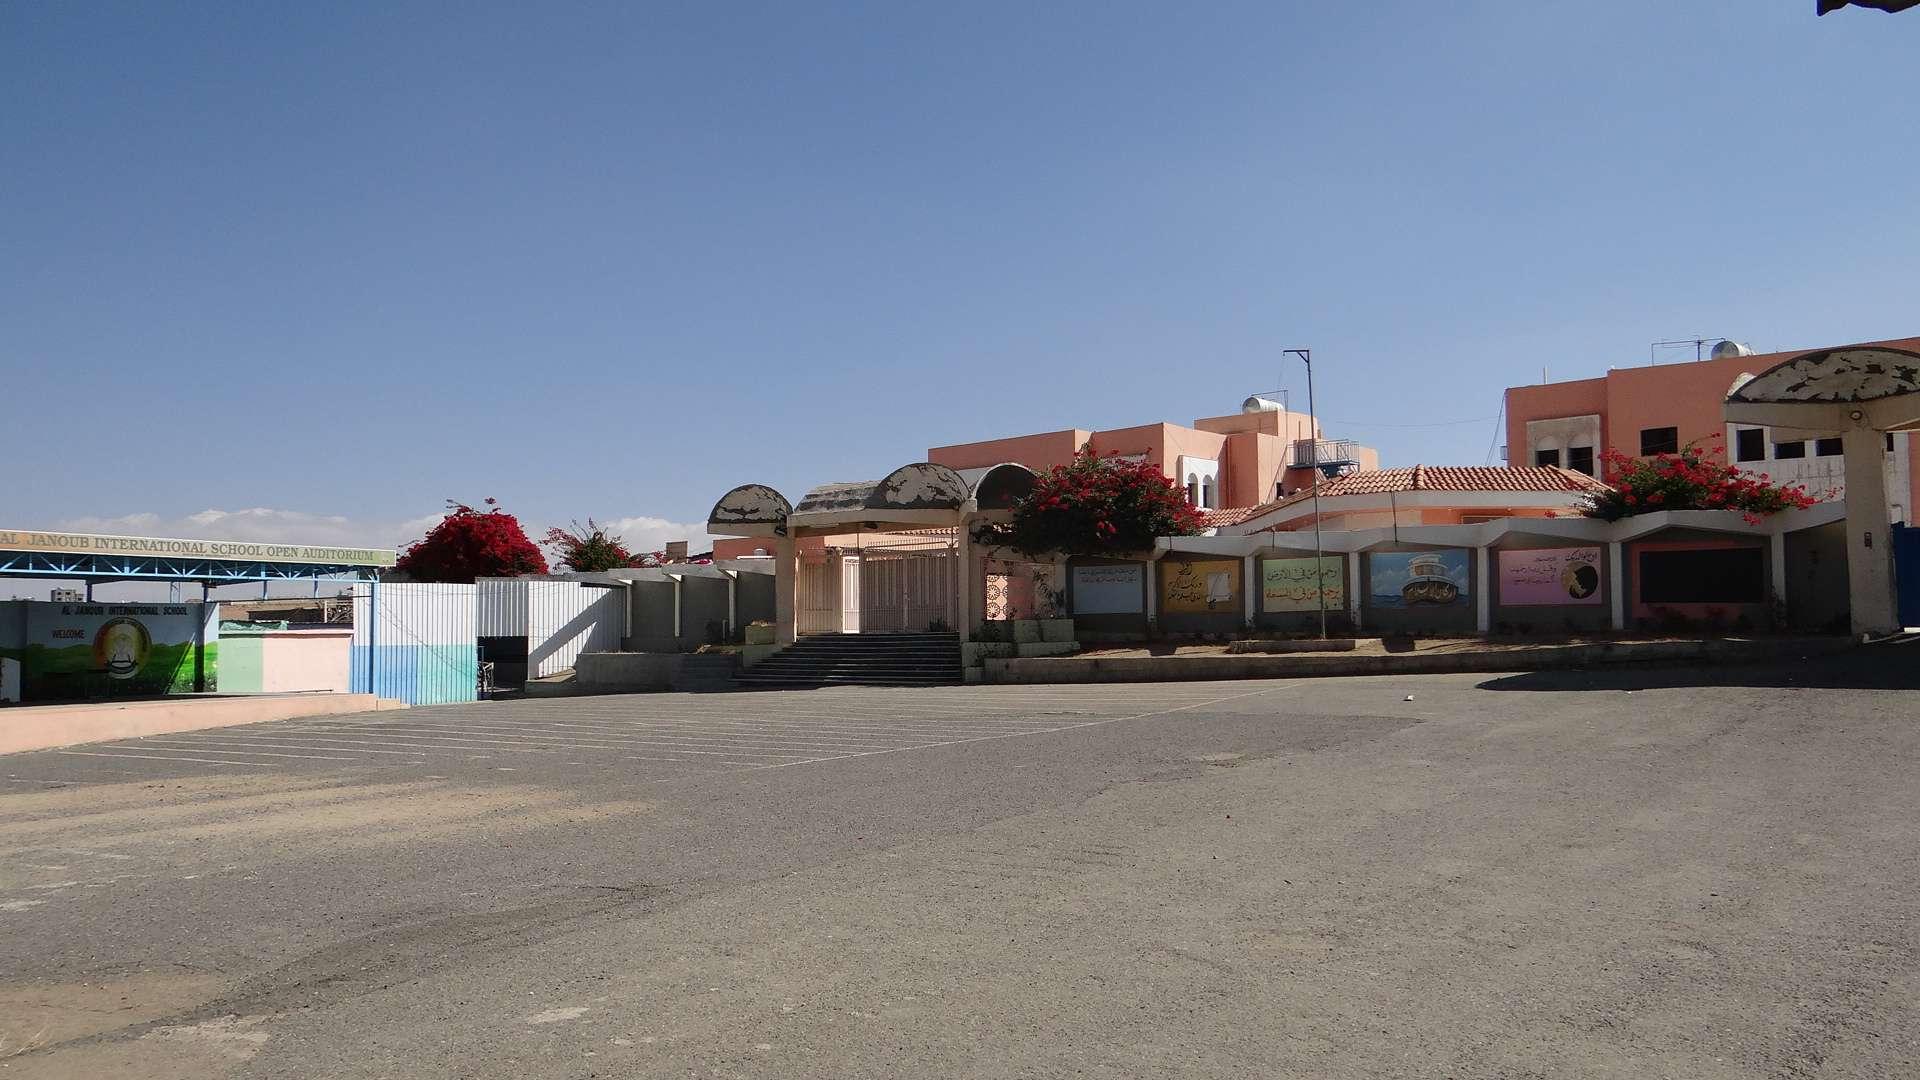 Al Janoub International School Khamis MushaytP B NO 51029 5730023